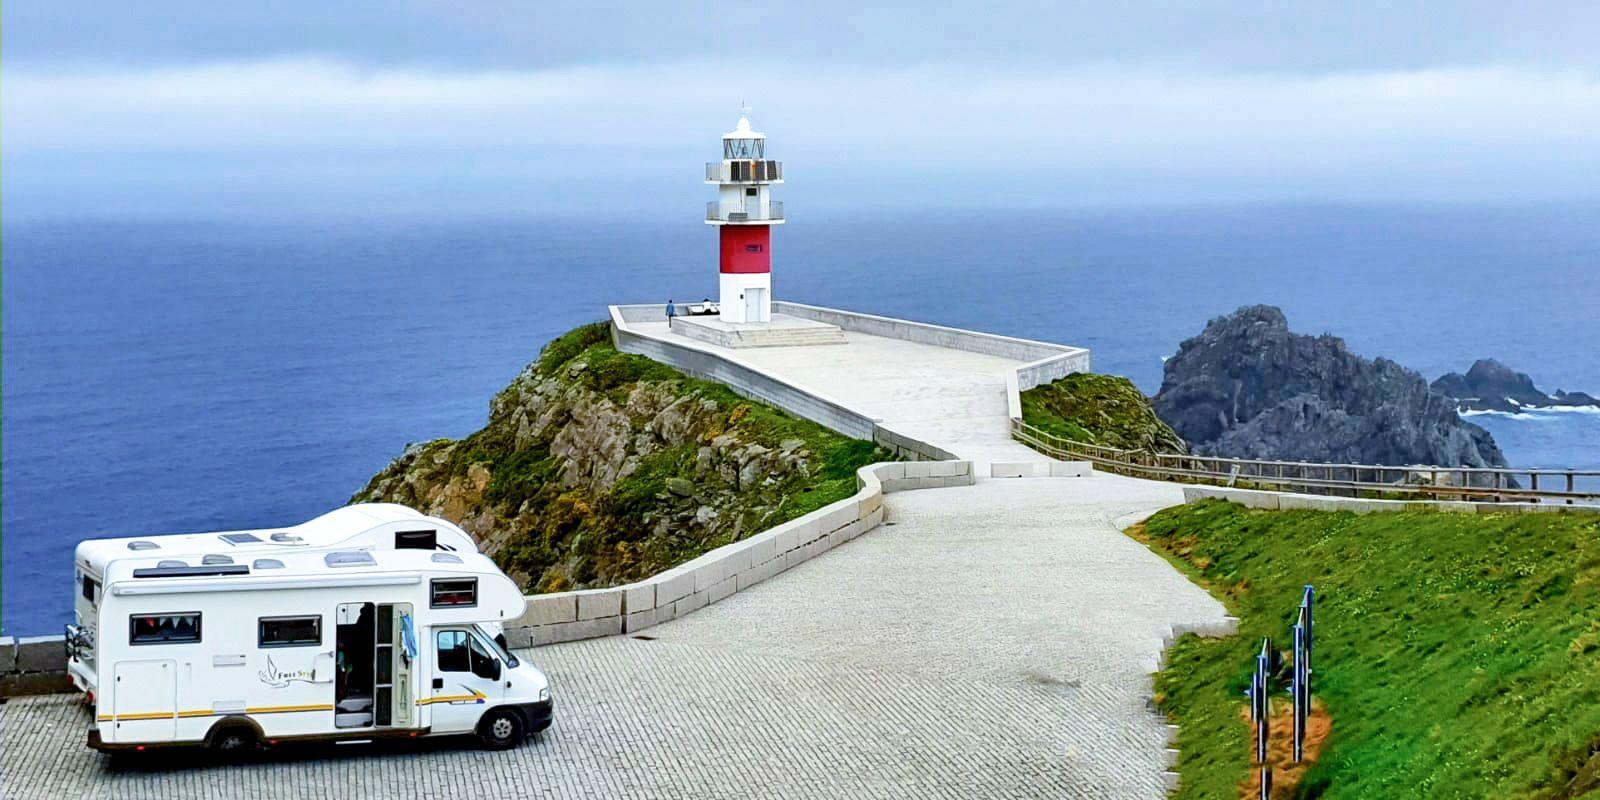 <span>Wohnmobilreise entlang der Atlantikküste Spaniens bis nach Portugal - Teil I</span>